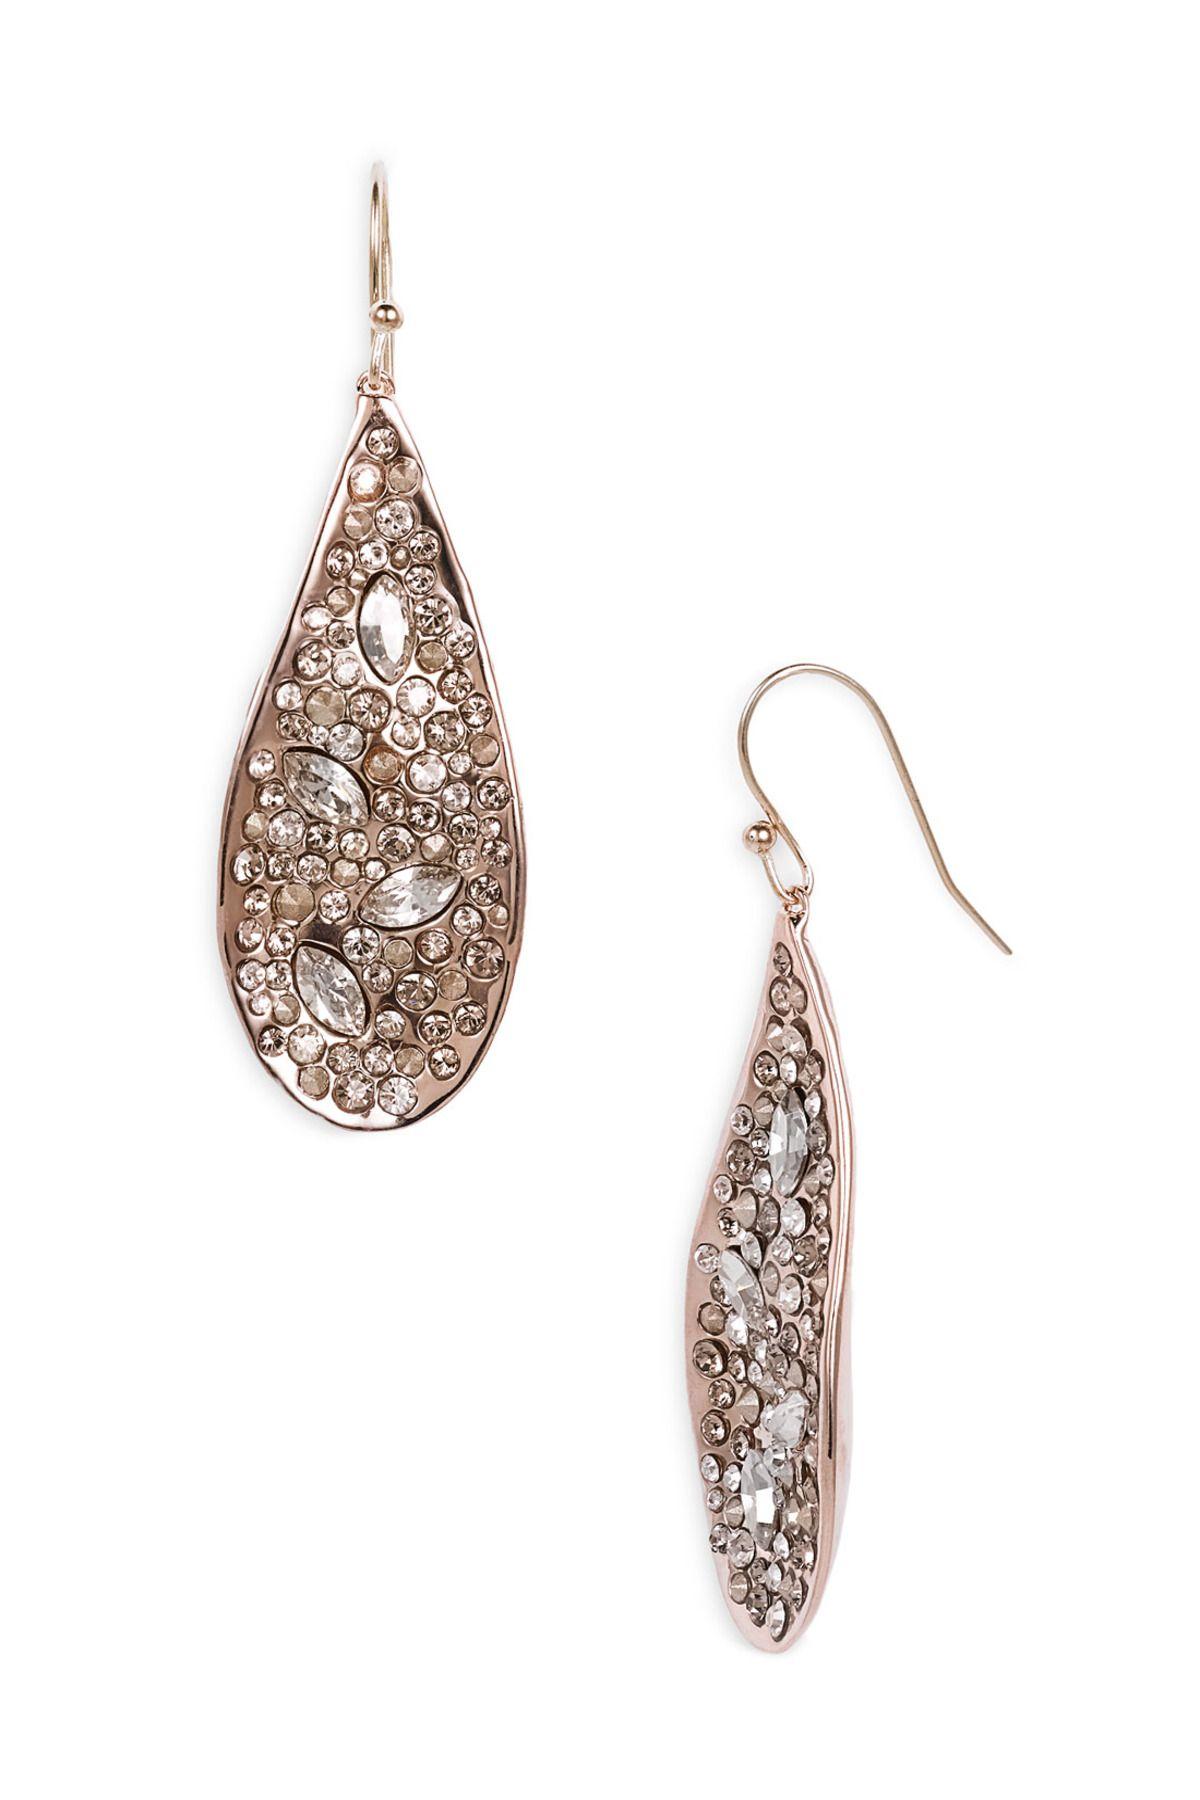 Alexis Bittar Miss Havisham Large Teardrop Earrings Nordstrom Rack